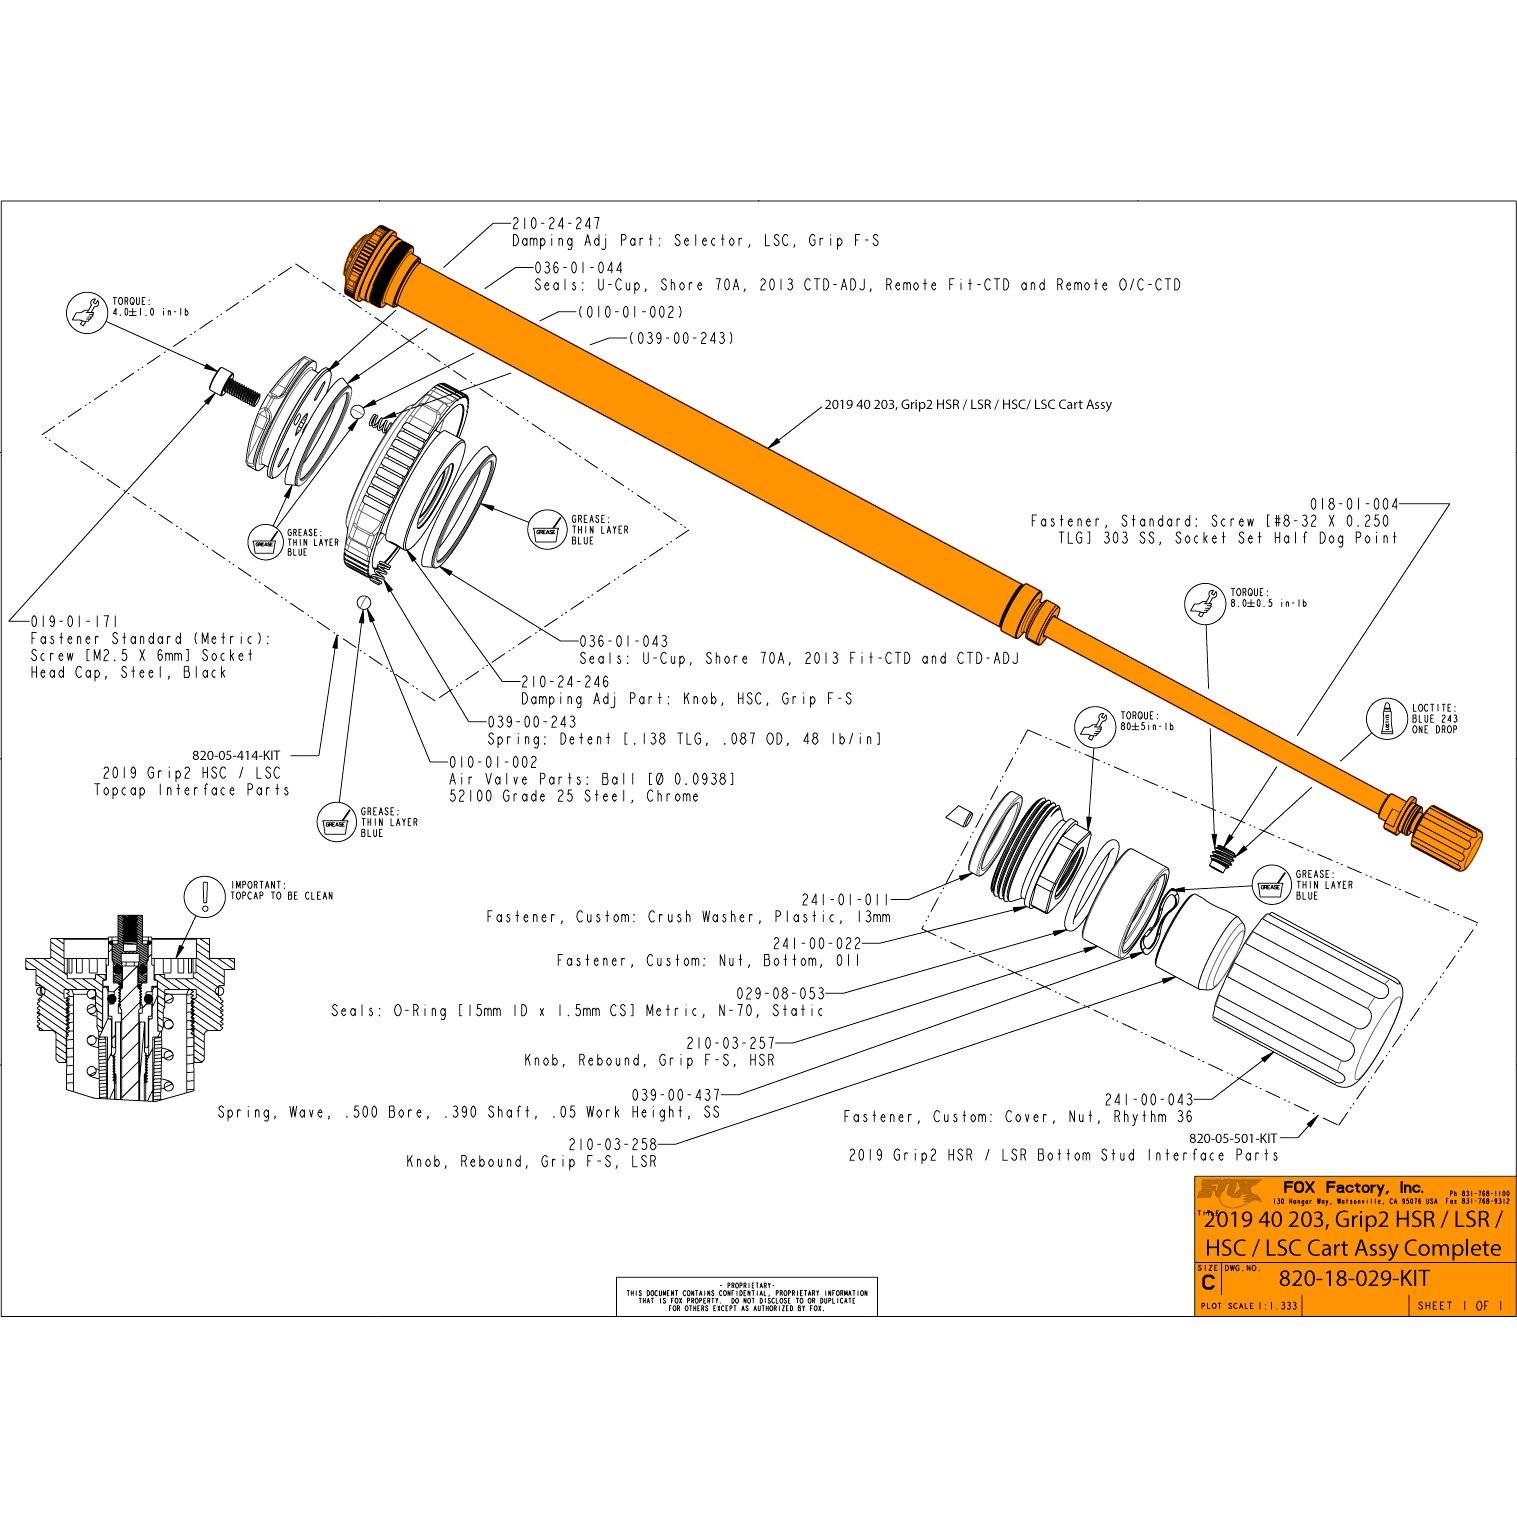 FOX GRIP2 HSR / LSR / HSC / LSC Cartridge for 40 Forks - MY 2019 - 820-18-029-KIT